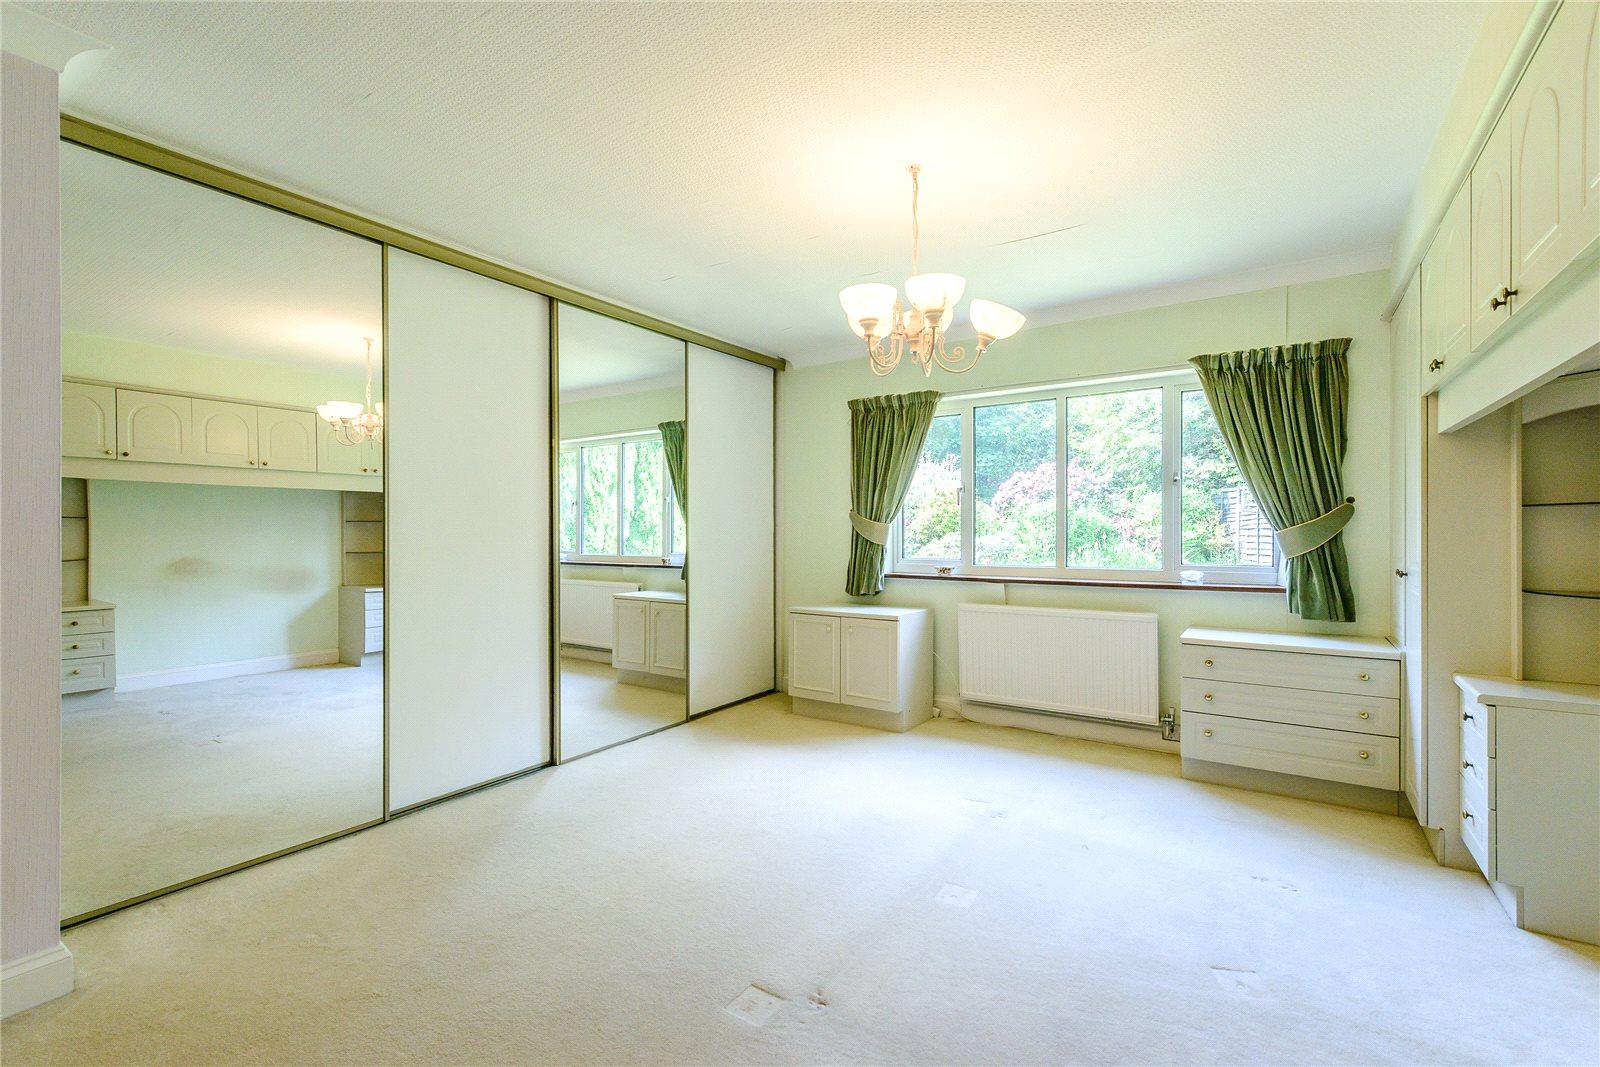 Additional photo for property listing at Snows Ride, Windlesham, Surrey, GU20 Windlesham, Angleterre